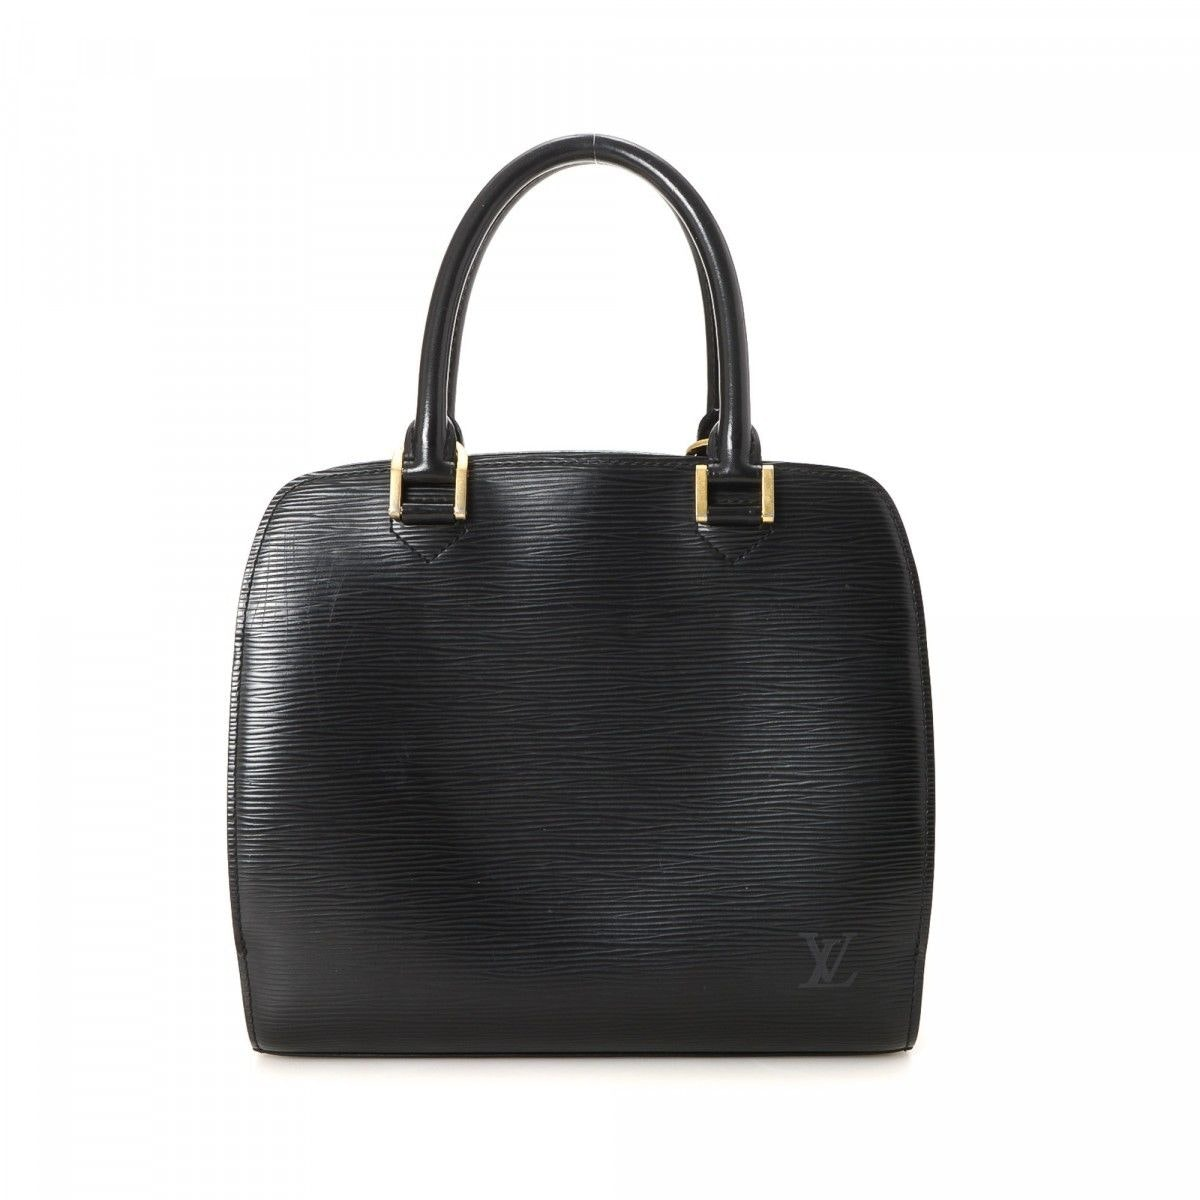 Louis Vuitton Pont Neuf Epi PM Black Brass